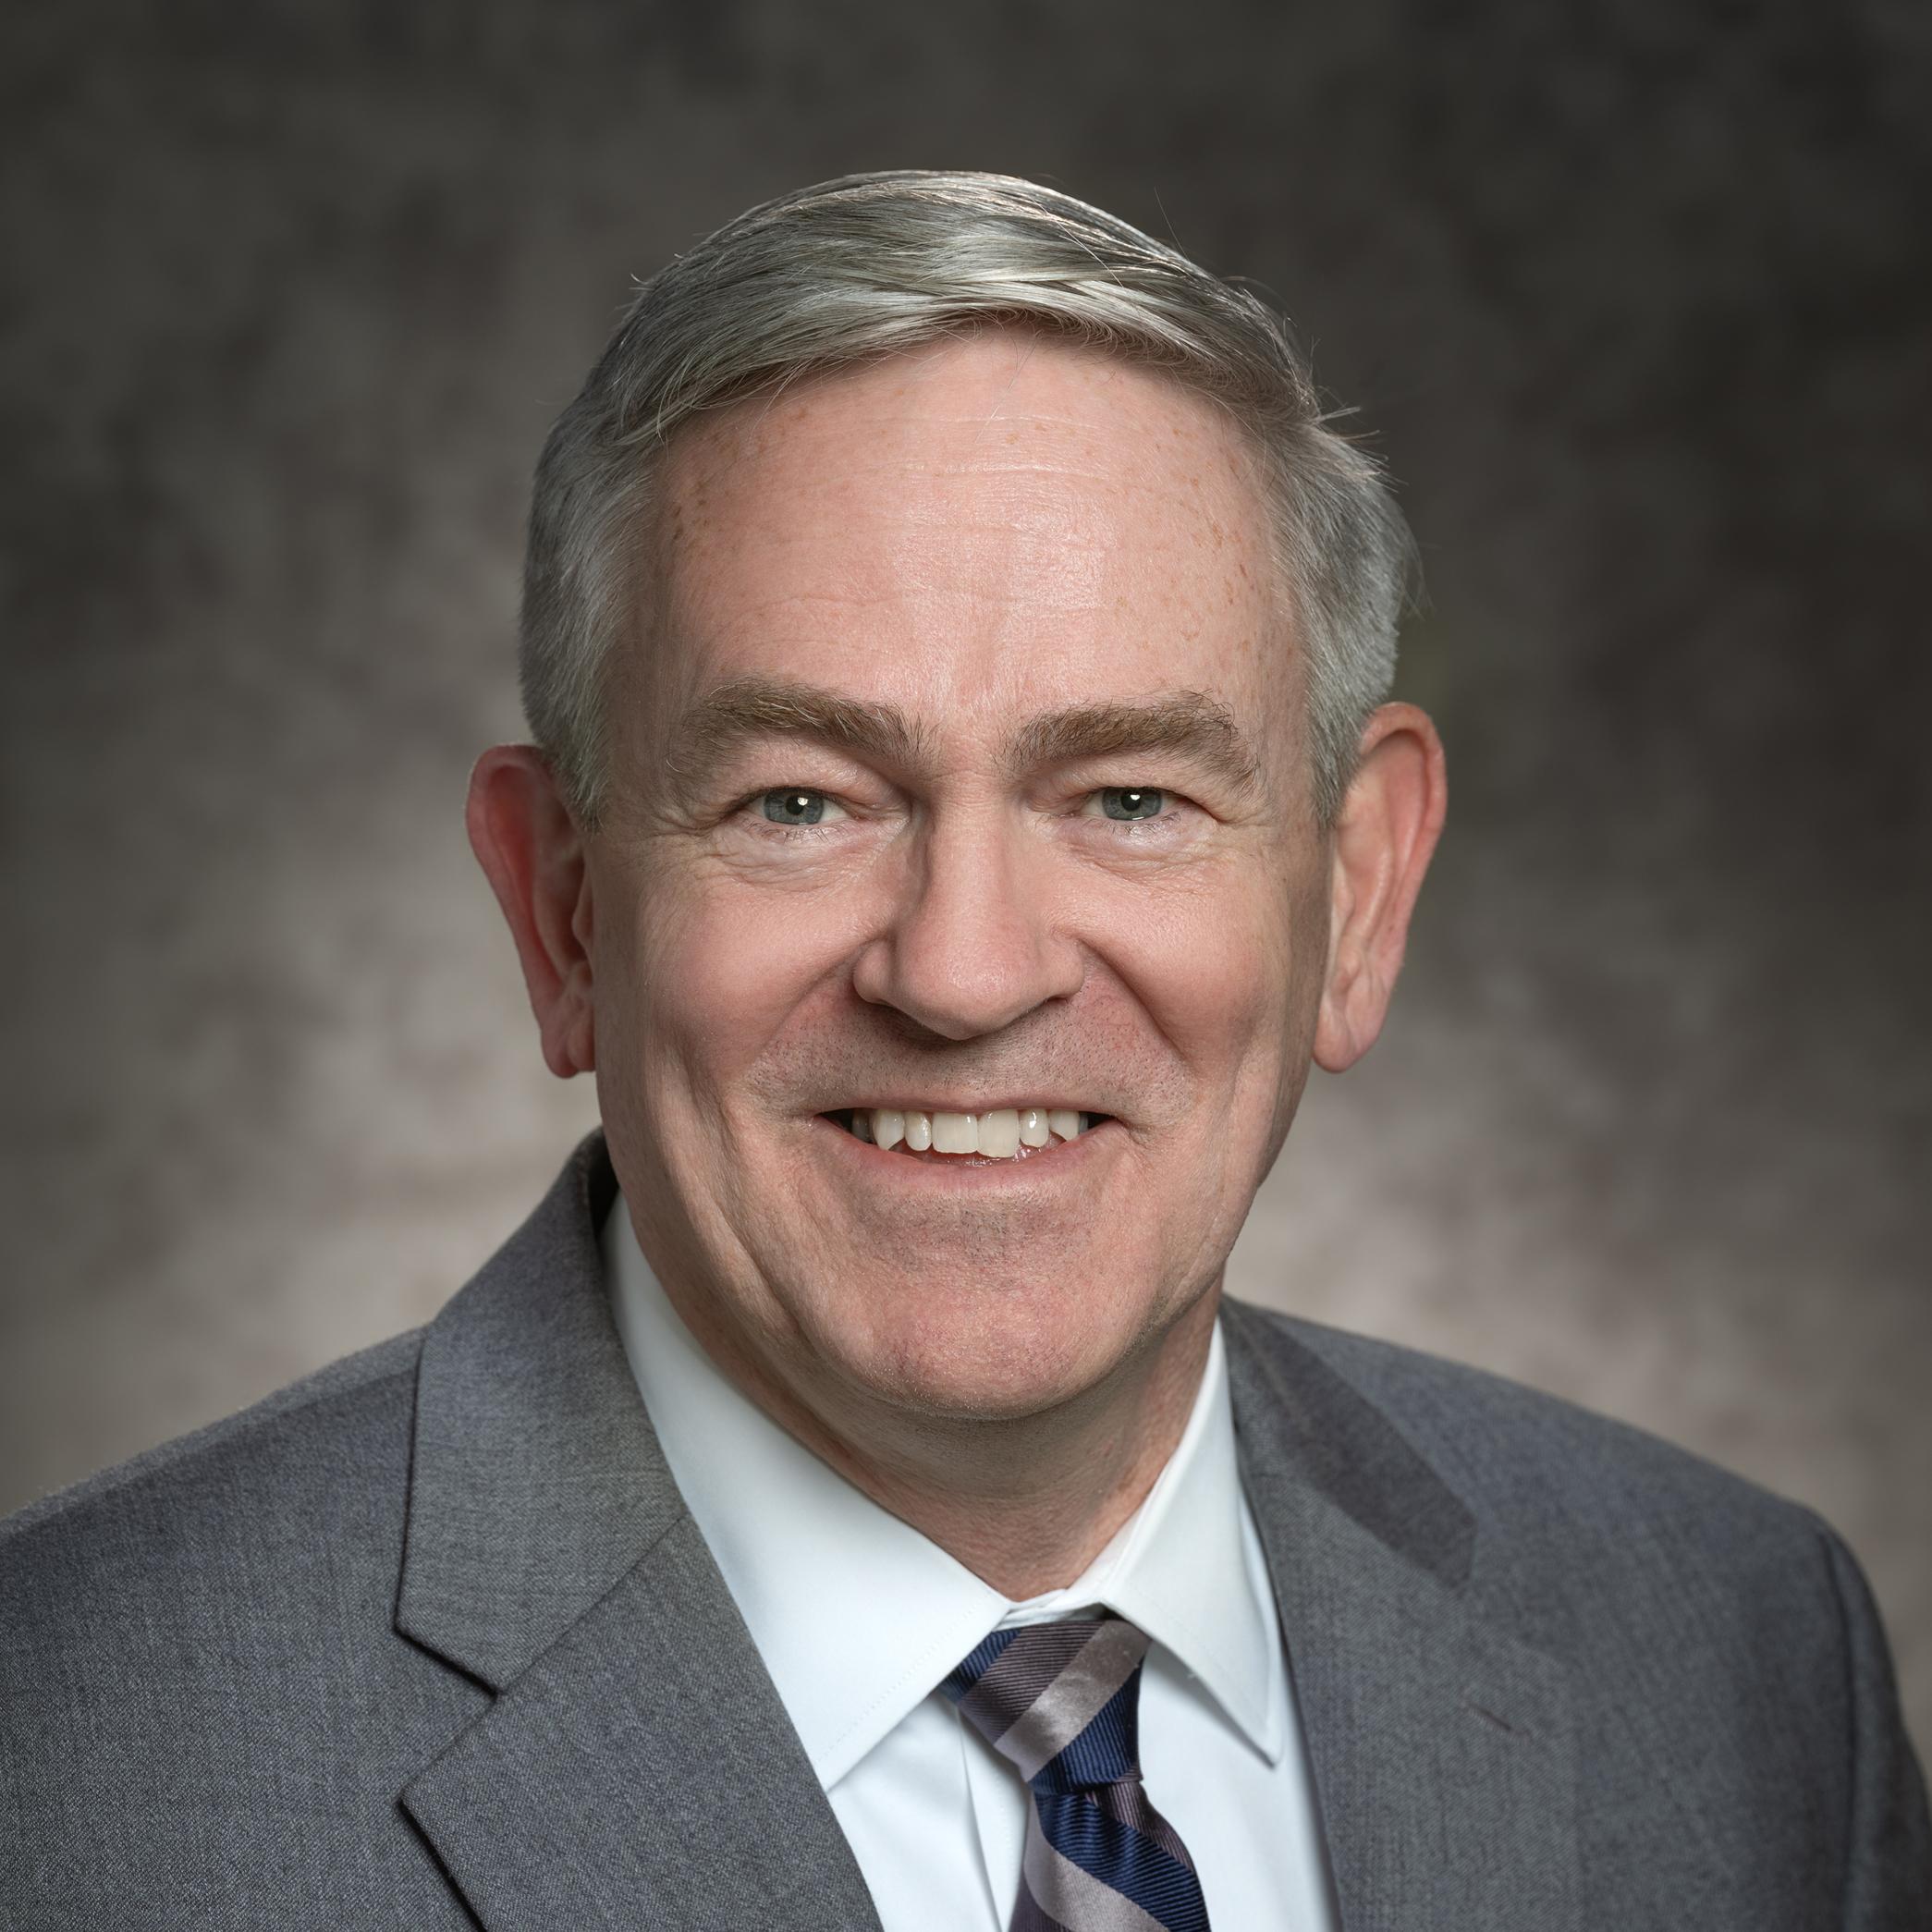 Frank Lowery